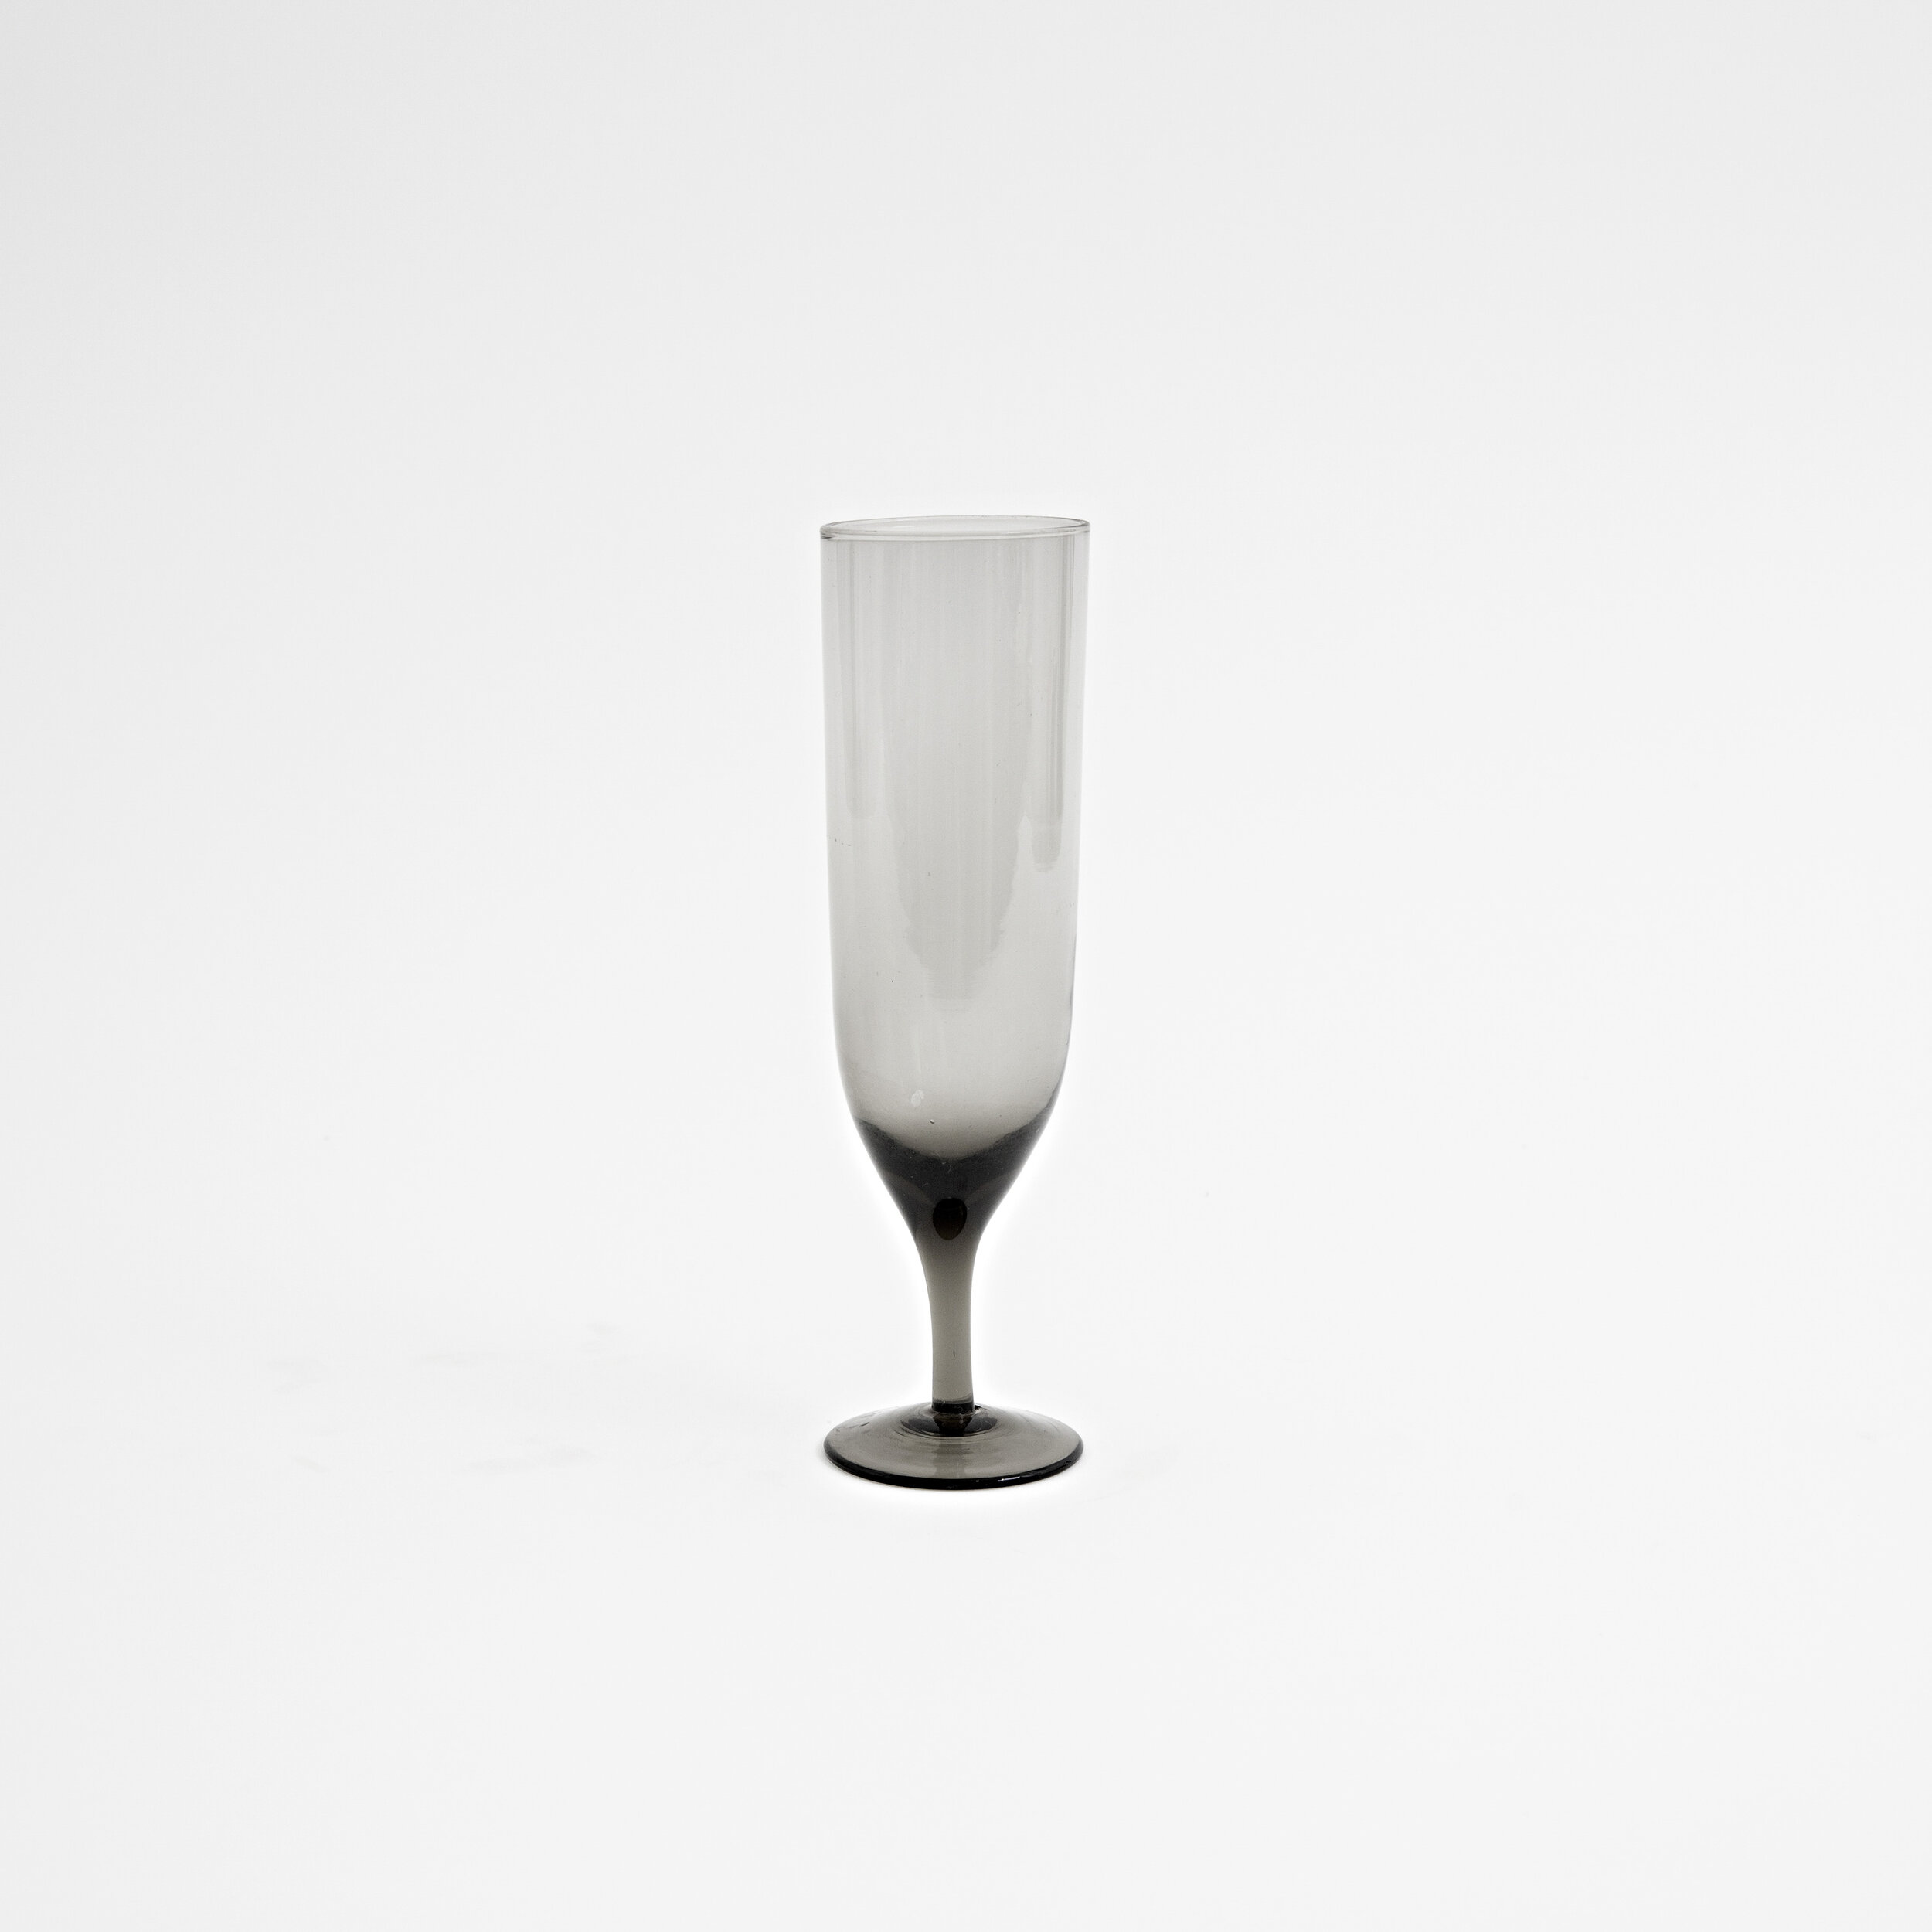 amwell-smoke-black-glass-champagne-flute-shop-mayker-nashville-home-gift-host-01.jpg